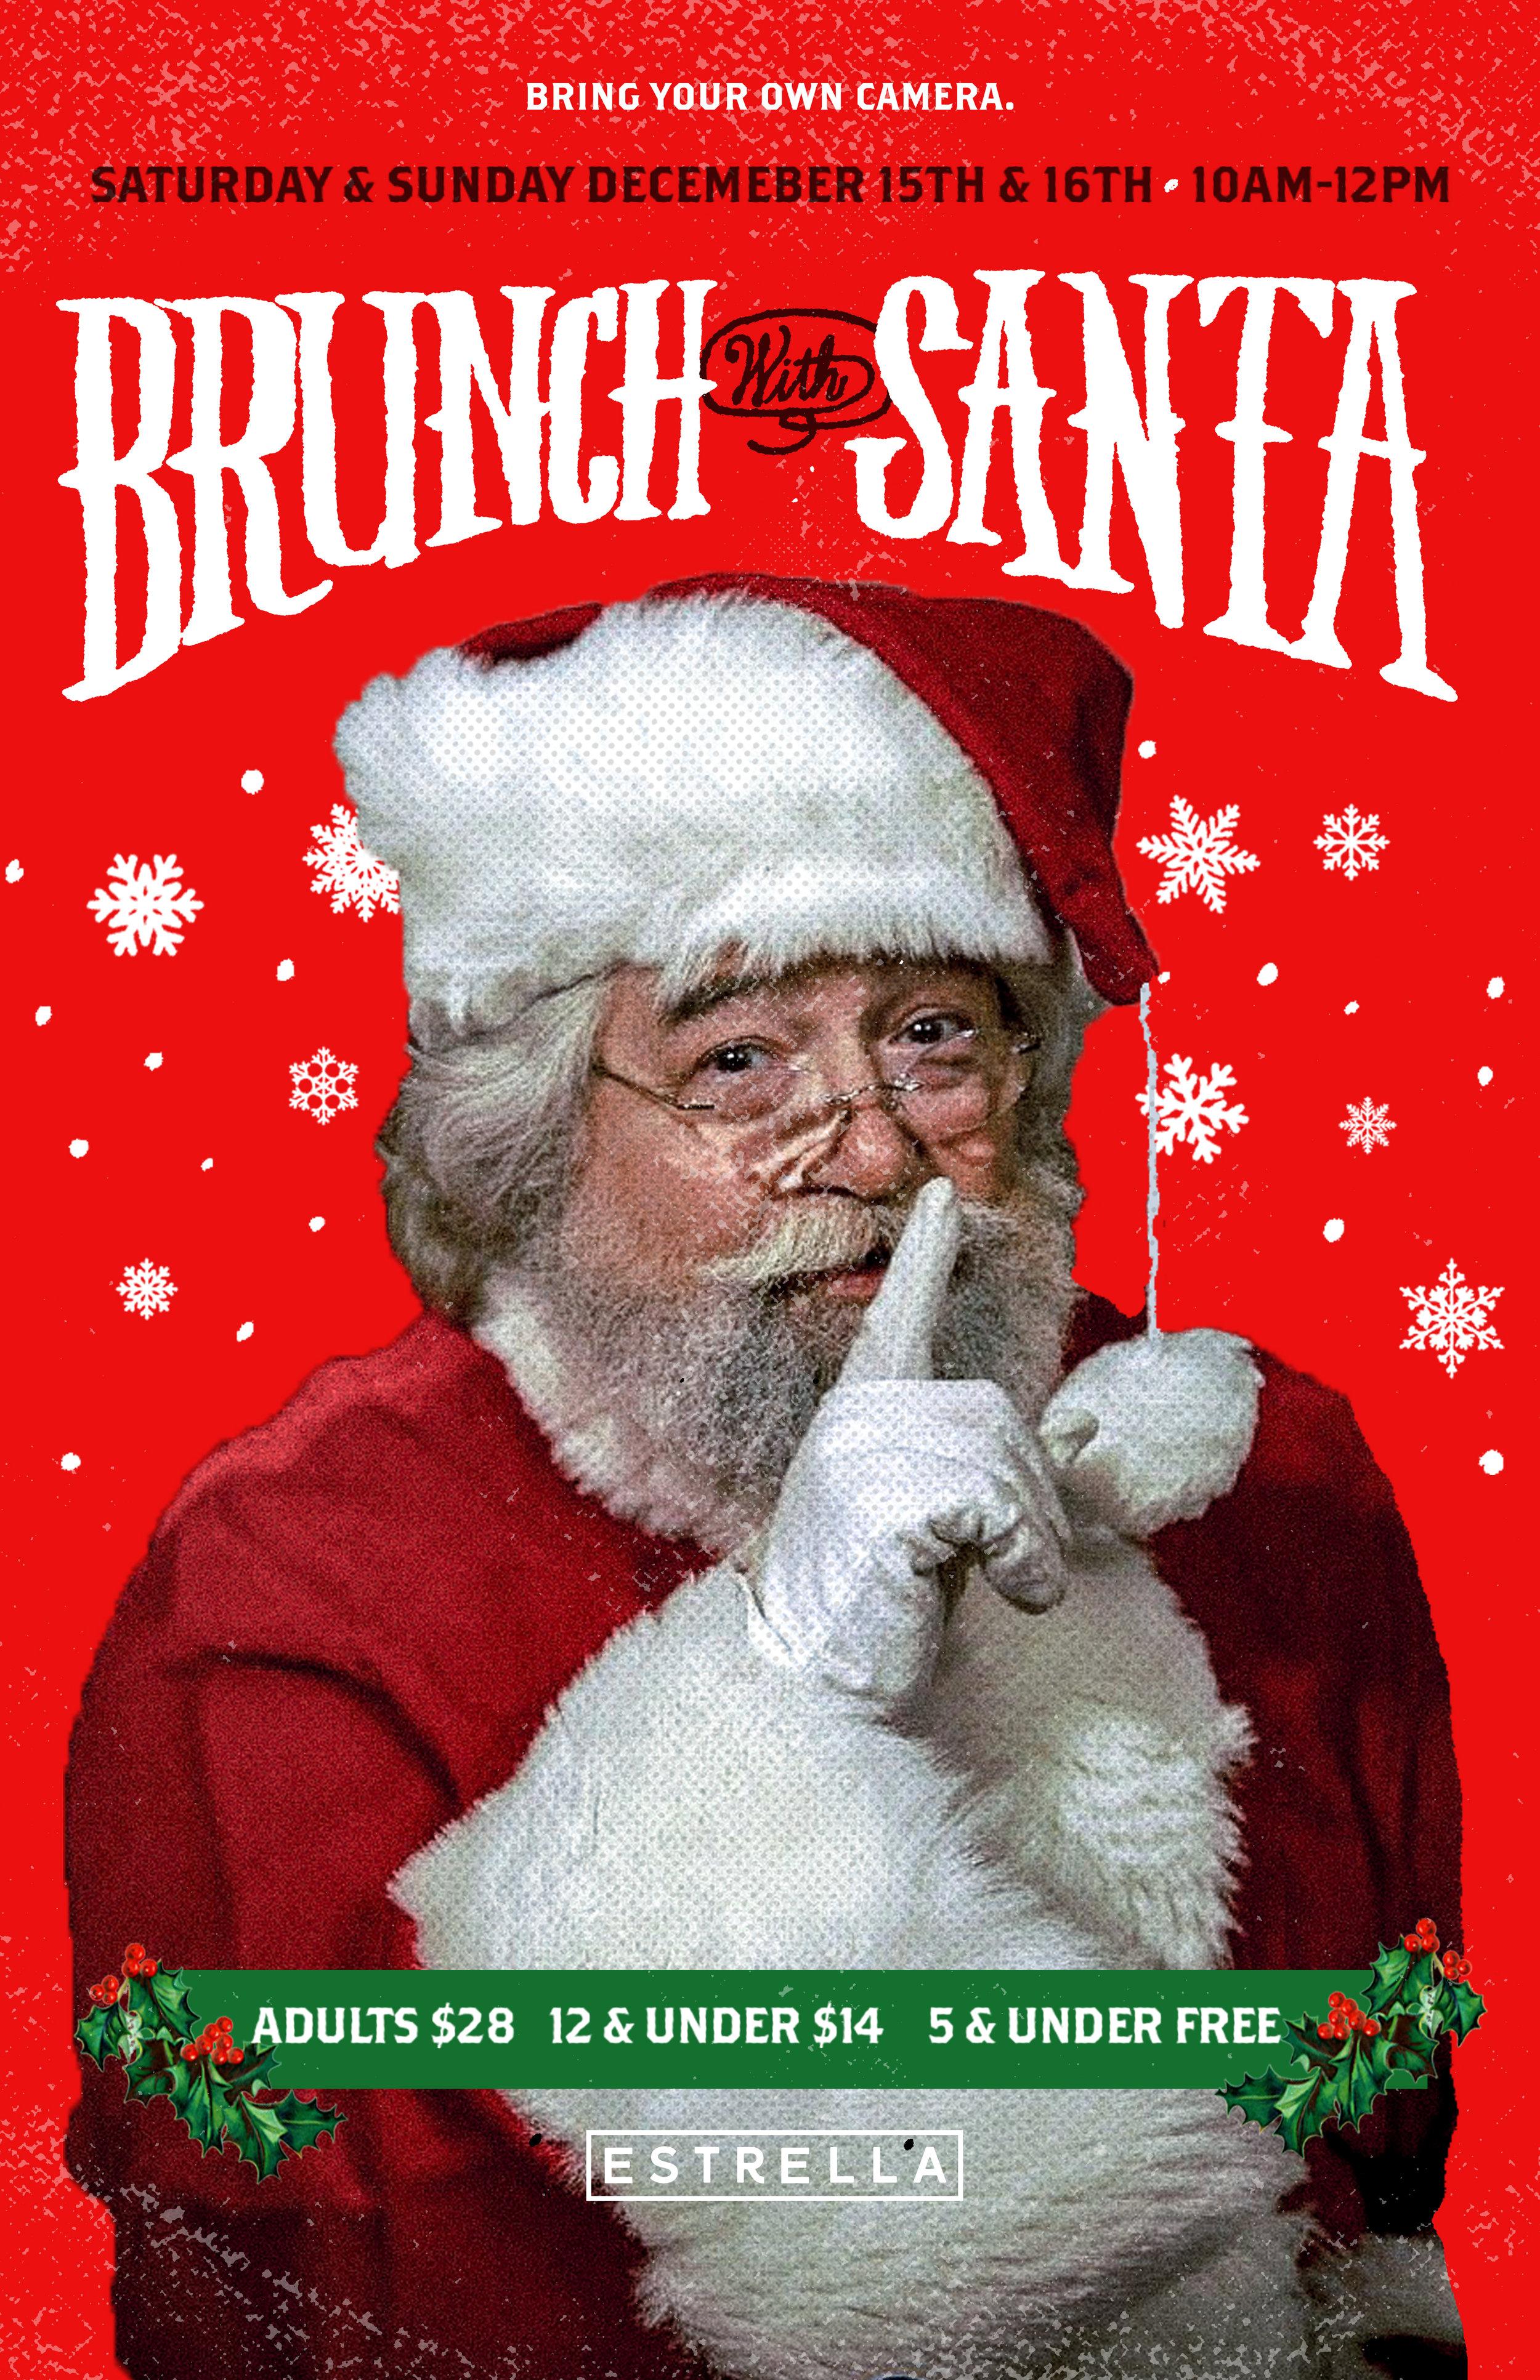 Santa3_poster.jpg